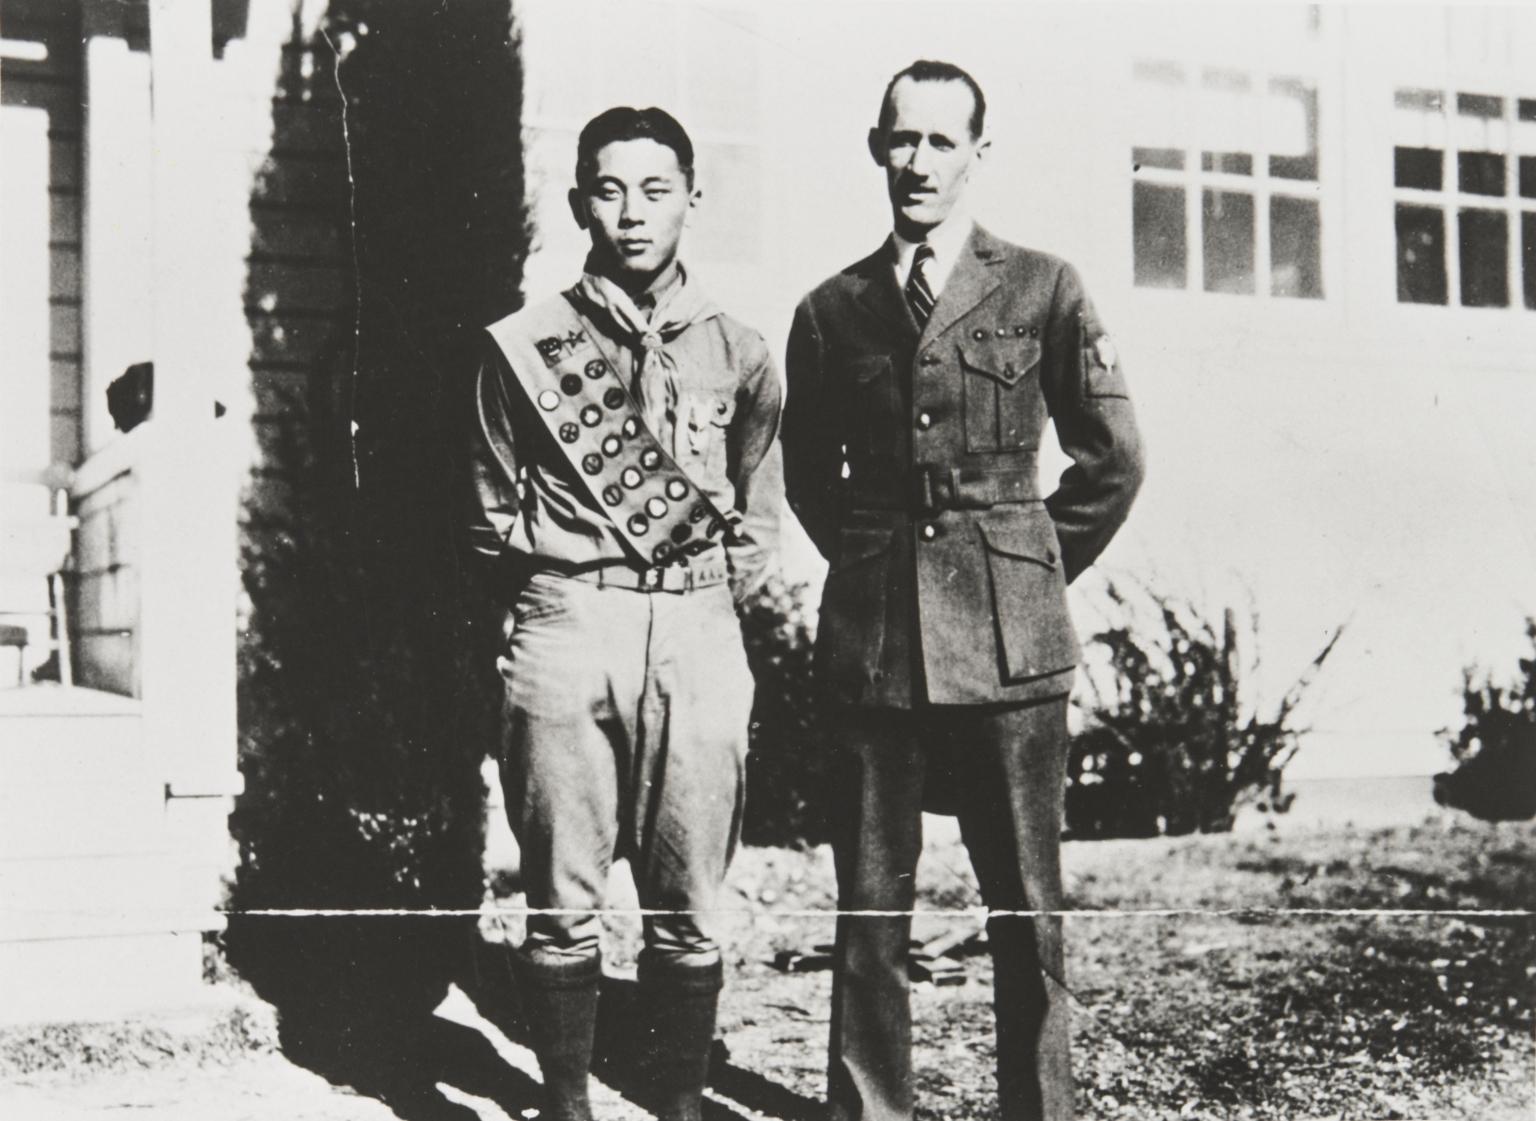 Paul Kurokawa, Eagle Scout with Scout Leader, Mr. Wilcox : 1931.